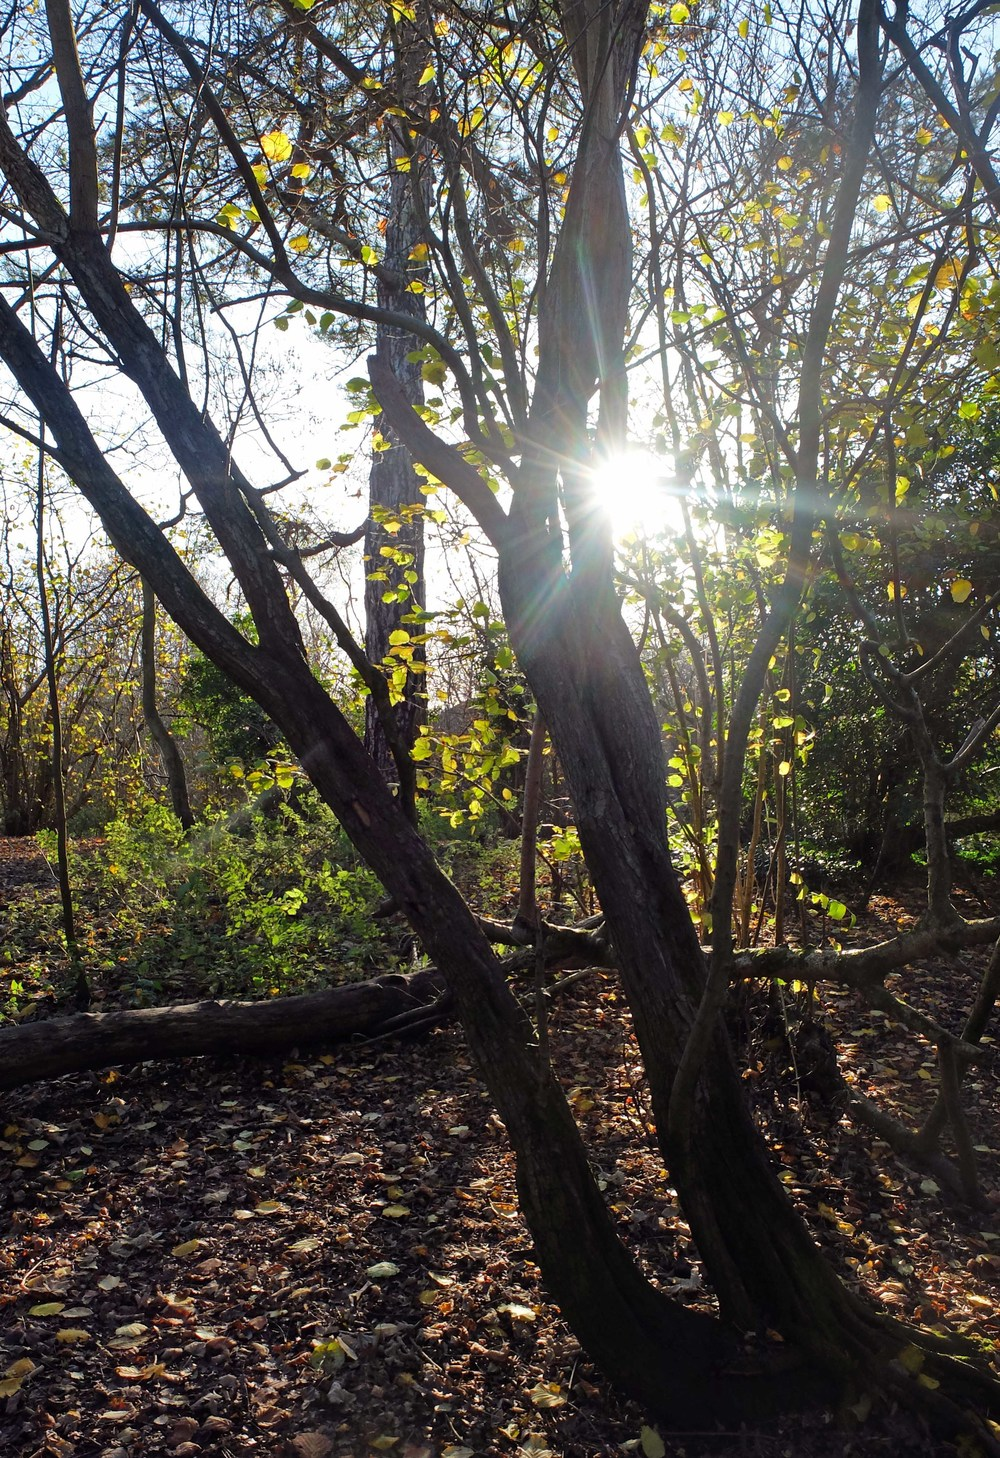 Trees iin winter.jpg